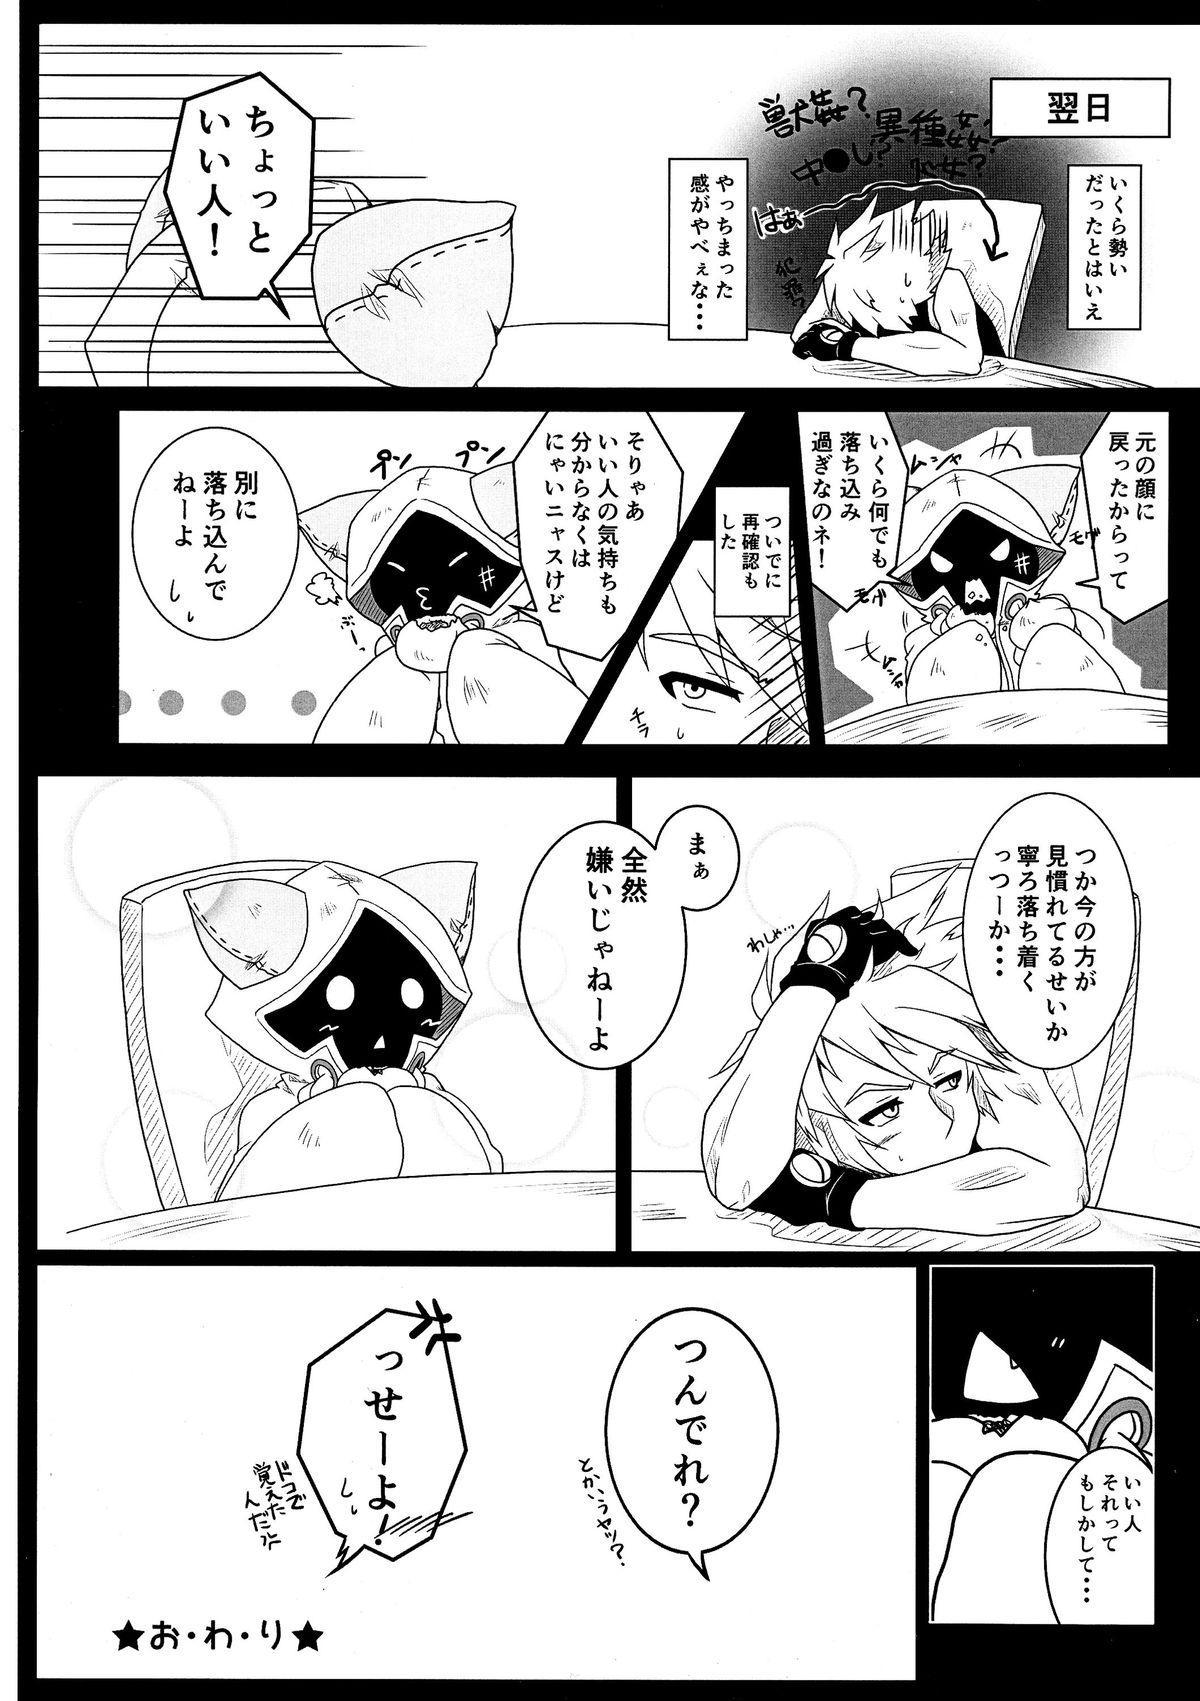 Tao no Ongaeshi 39